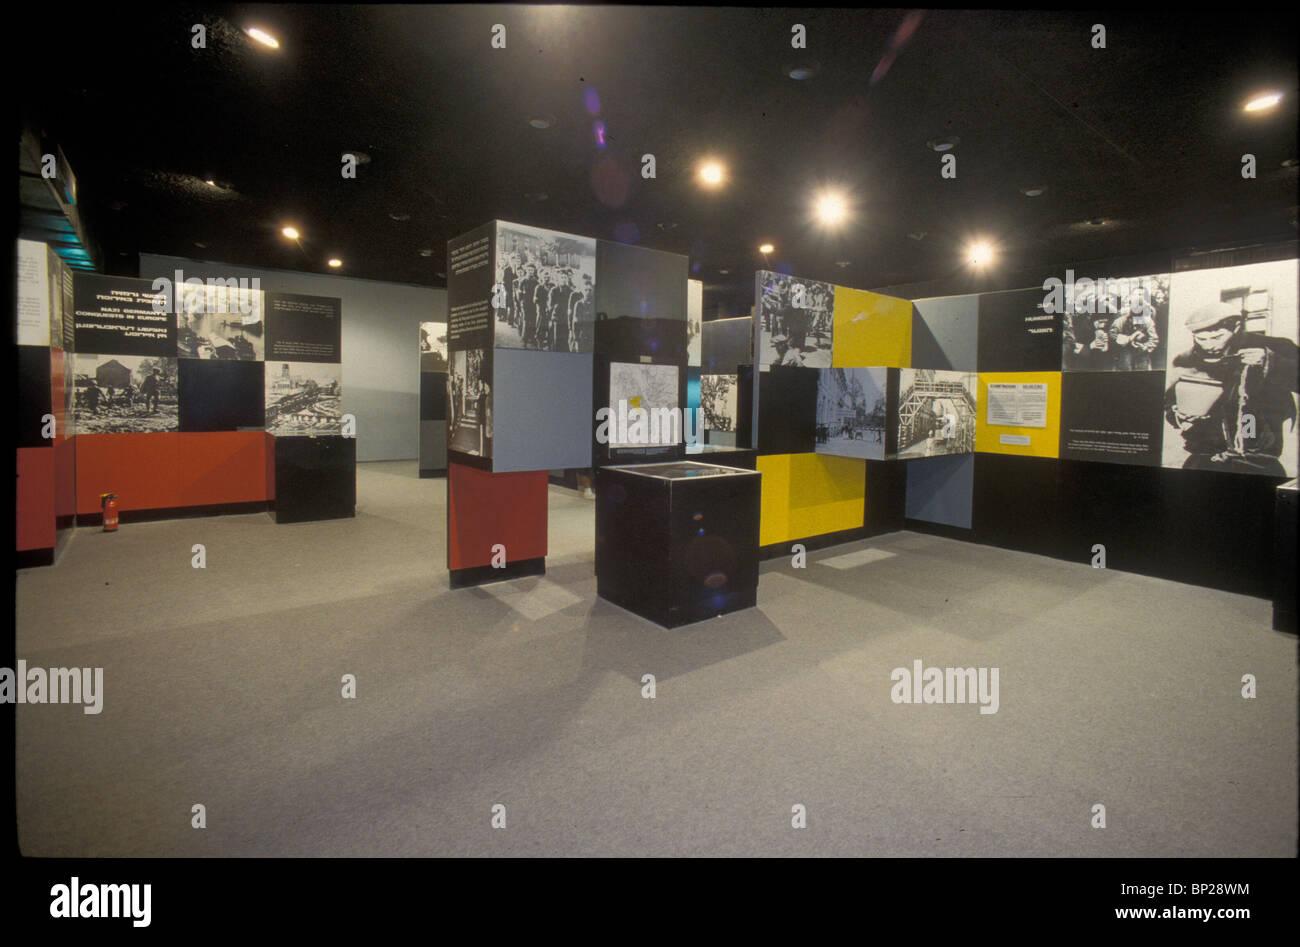 2379. YAD VASHEM - THE HISTORICAL MUSEUM DOCUMENTING THE HOLOCAUST THROUGH PHOTOGRAPHS, ARTIFACTS, DOCUMENTS ECT. - Stock Image